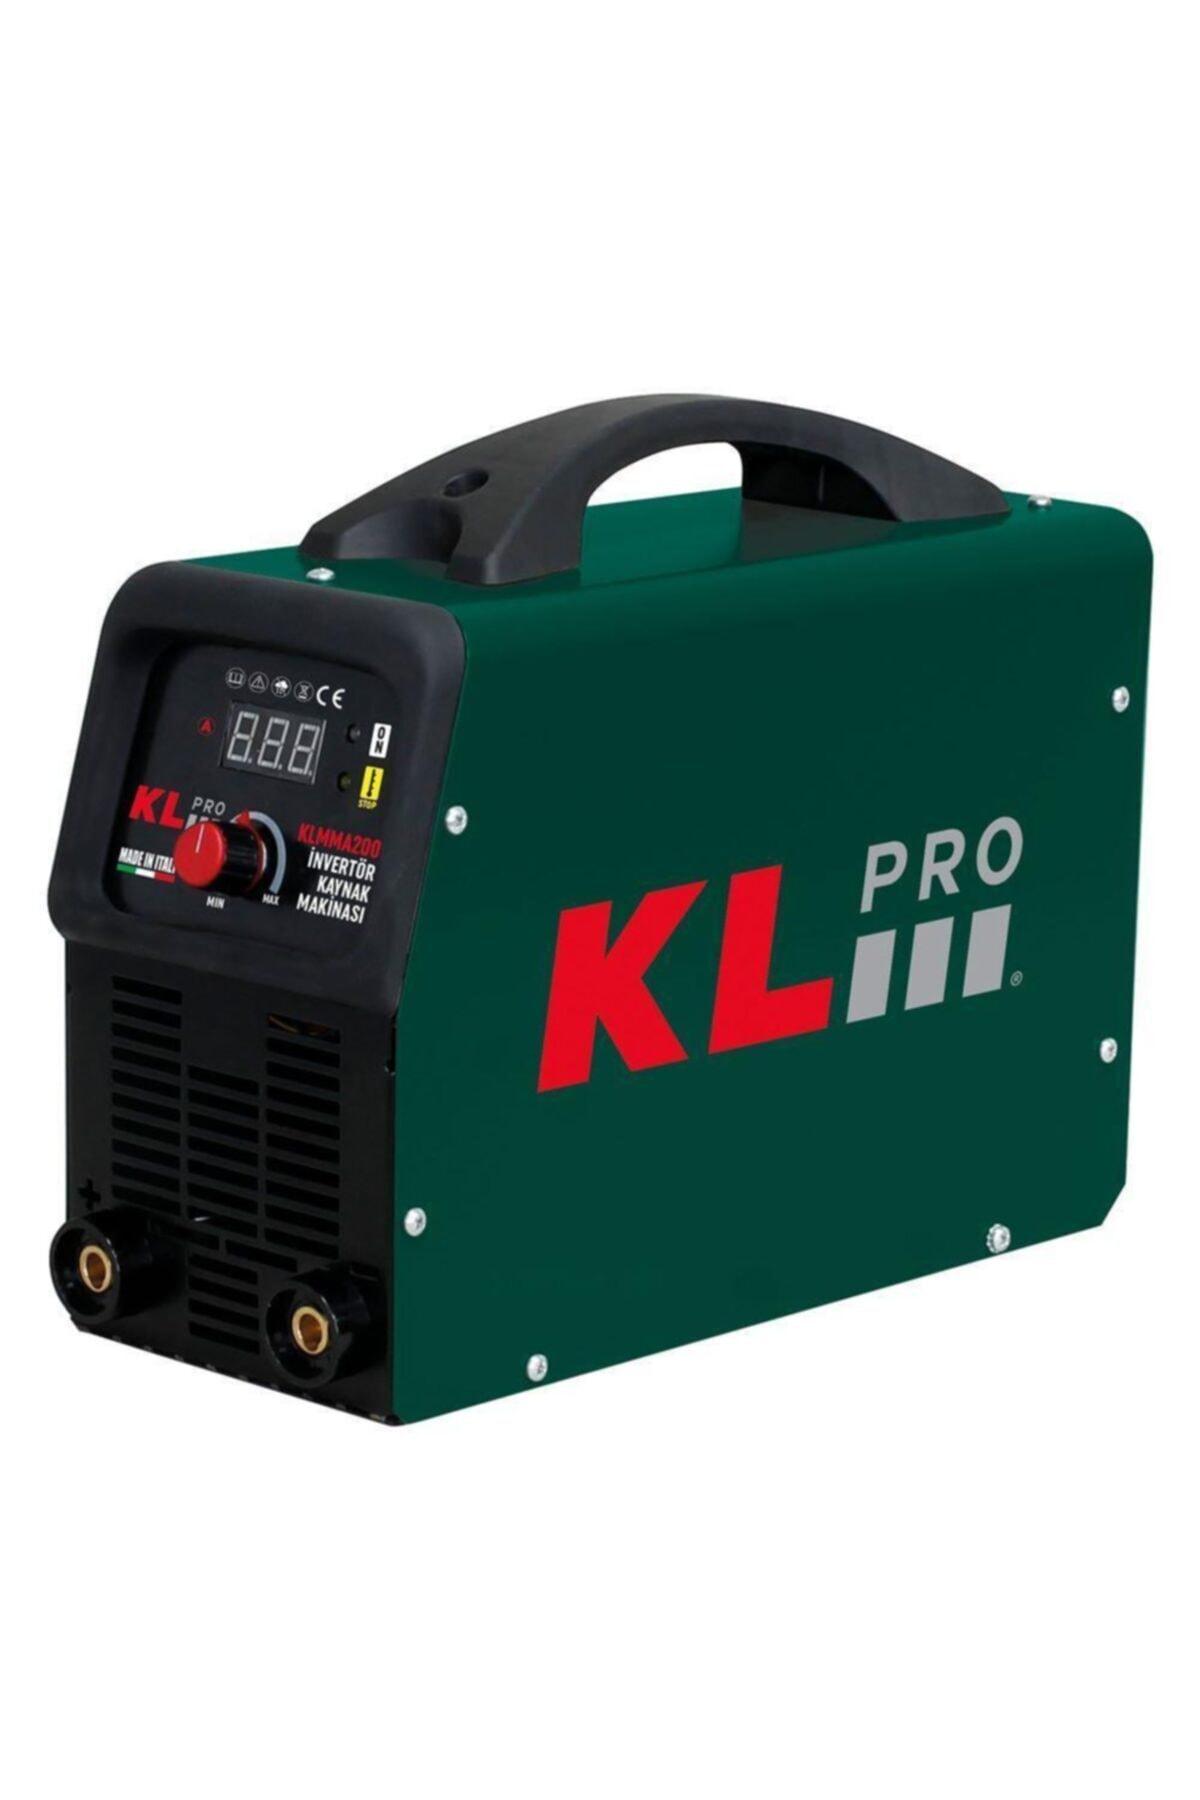 KLPRO Inverter Kaynak Makinesi 200 Amper Klmma200 1